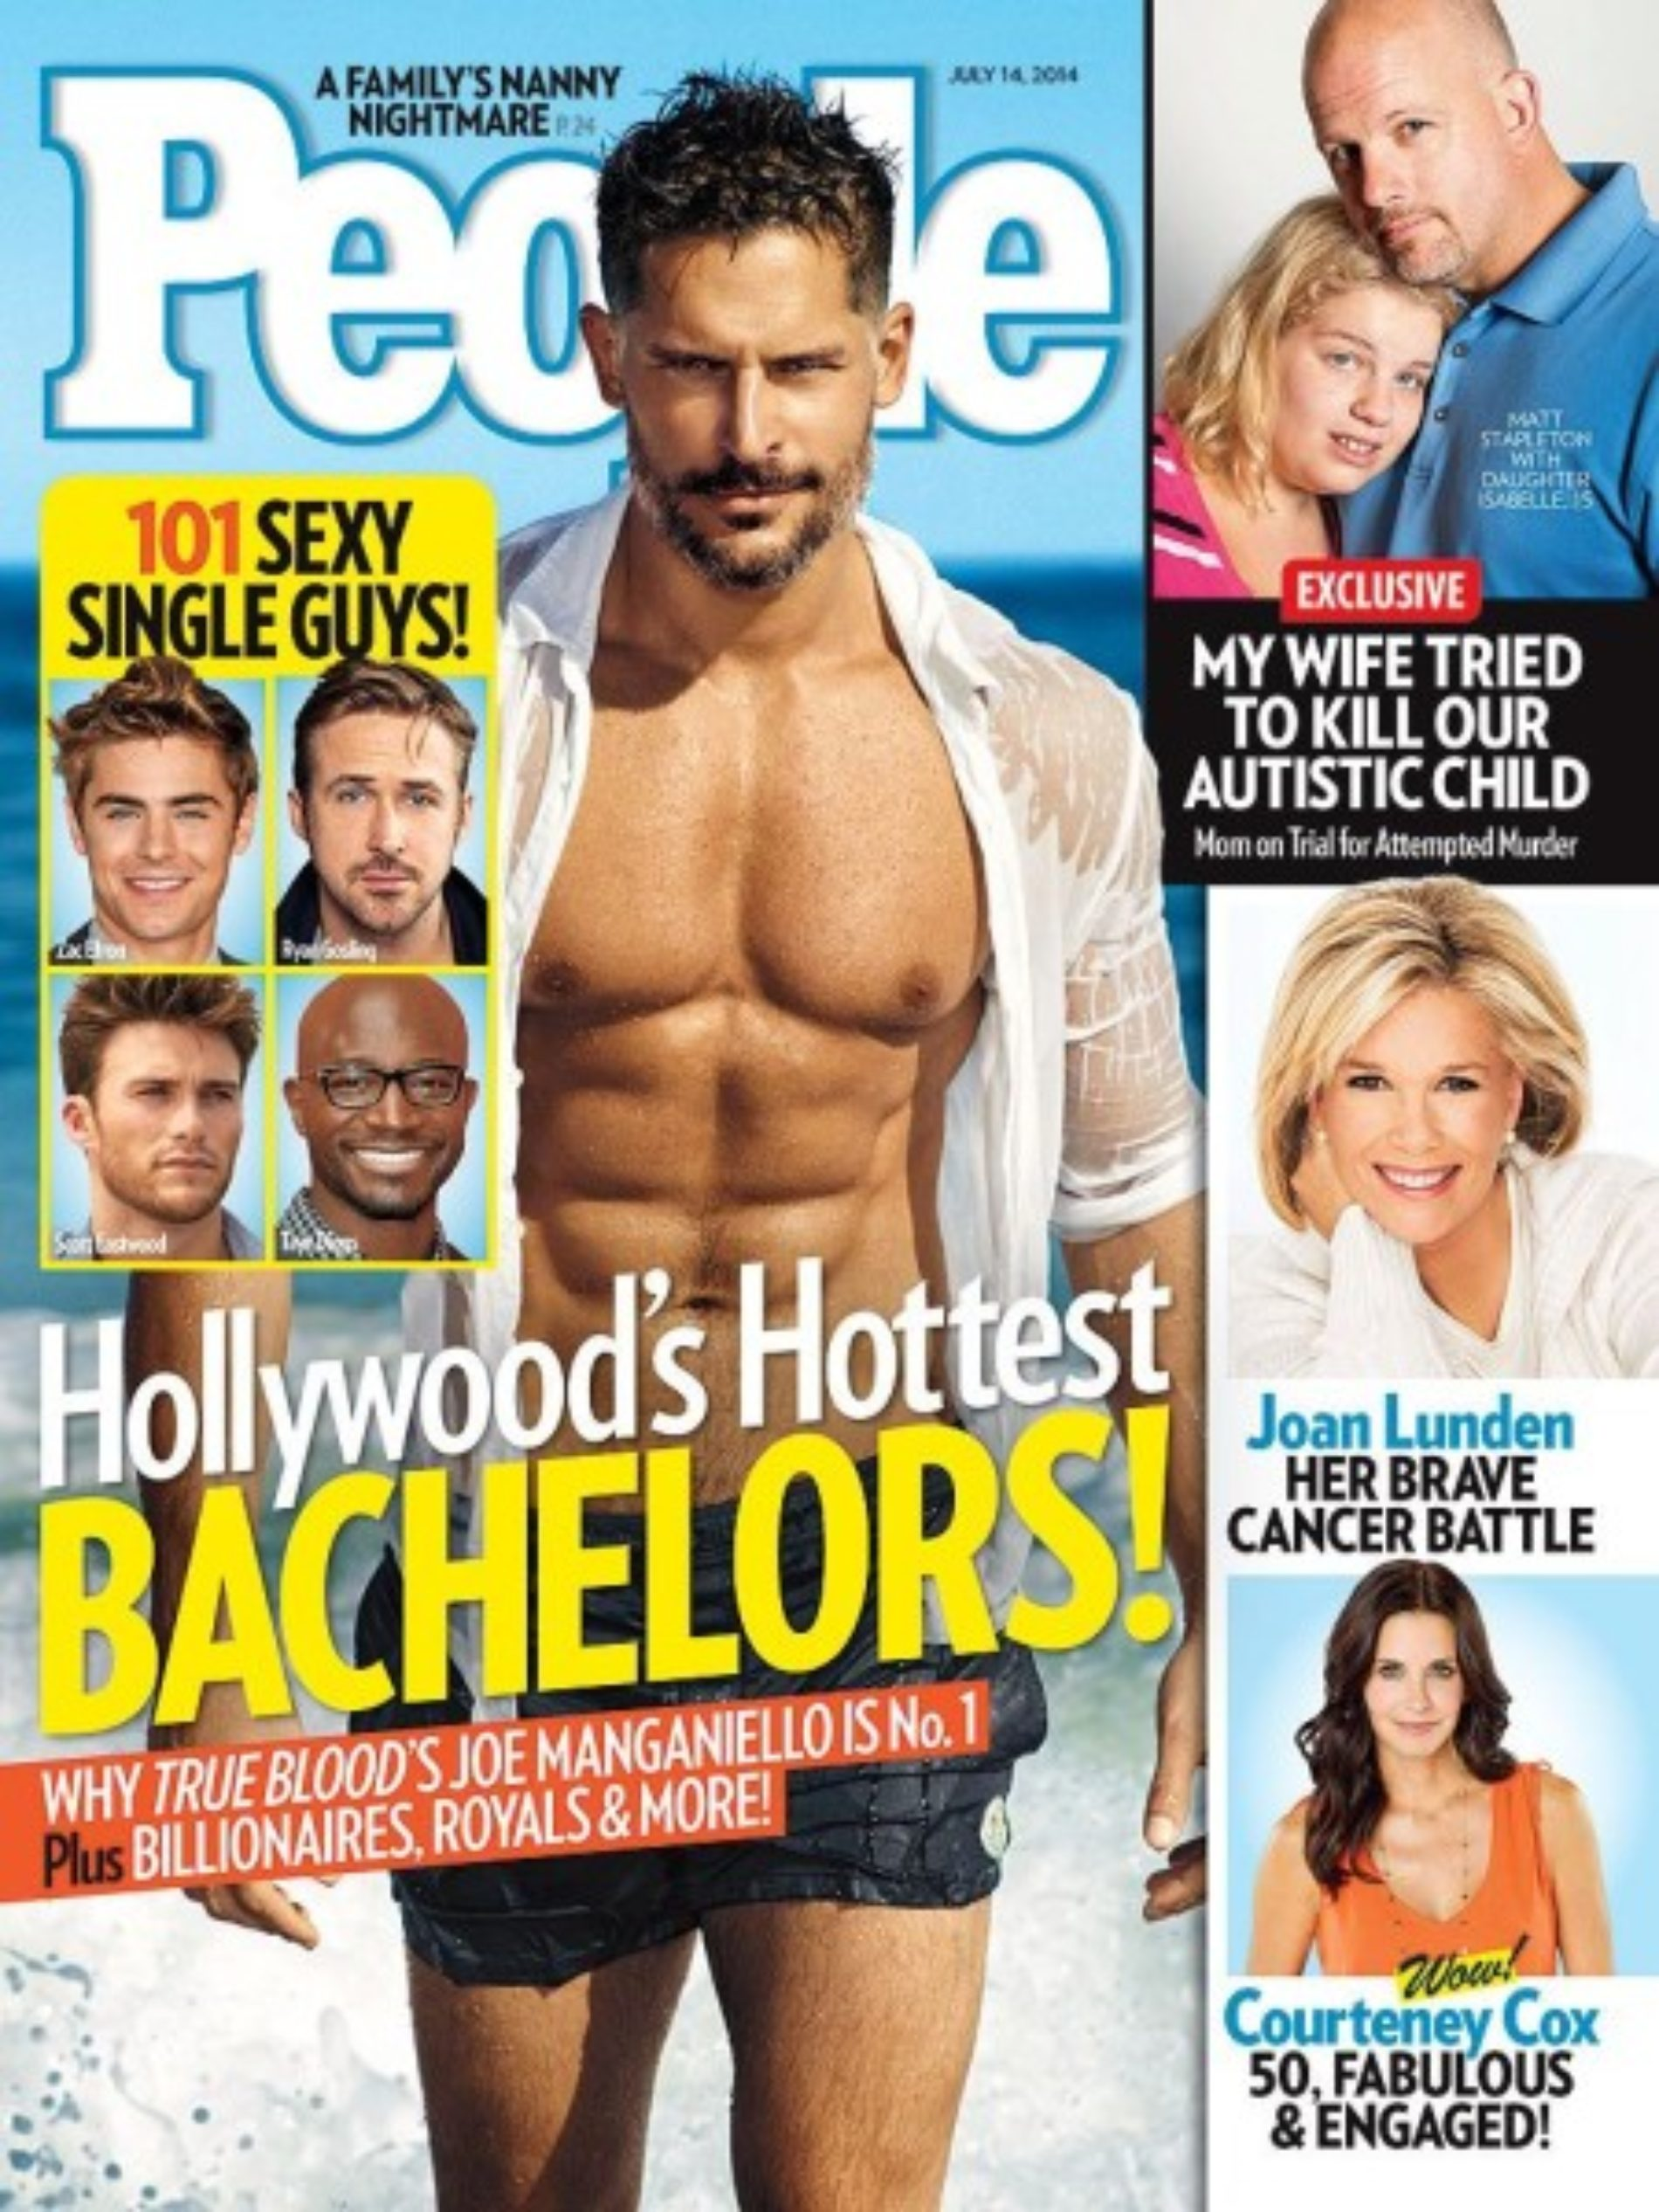 Actor Joe Manganiello named People Magazine's Hottest Bachelor